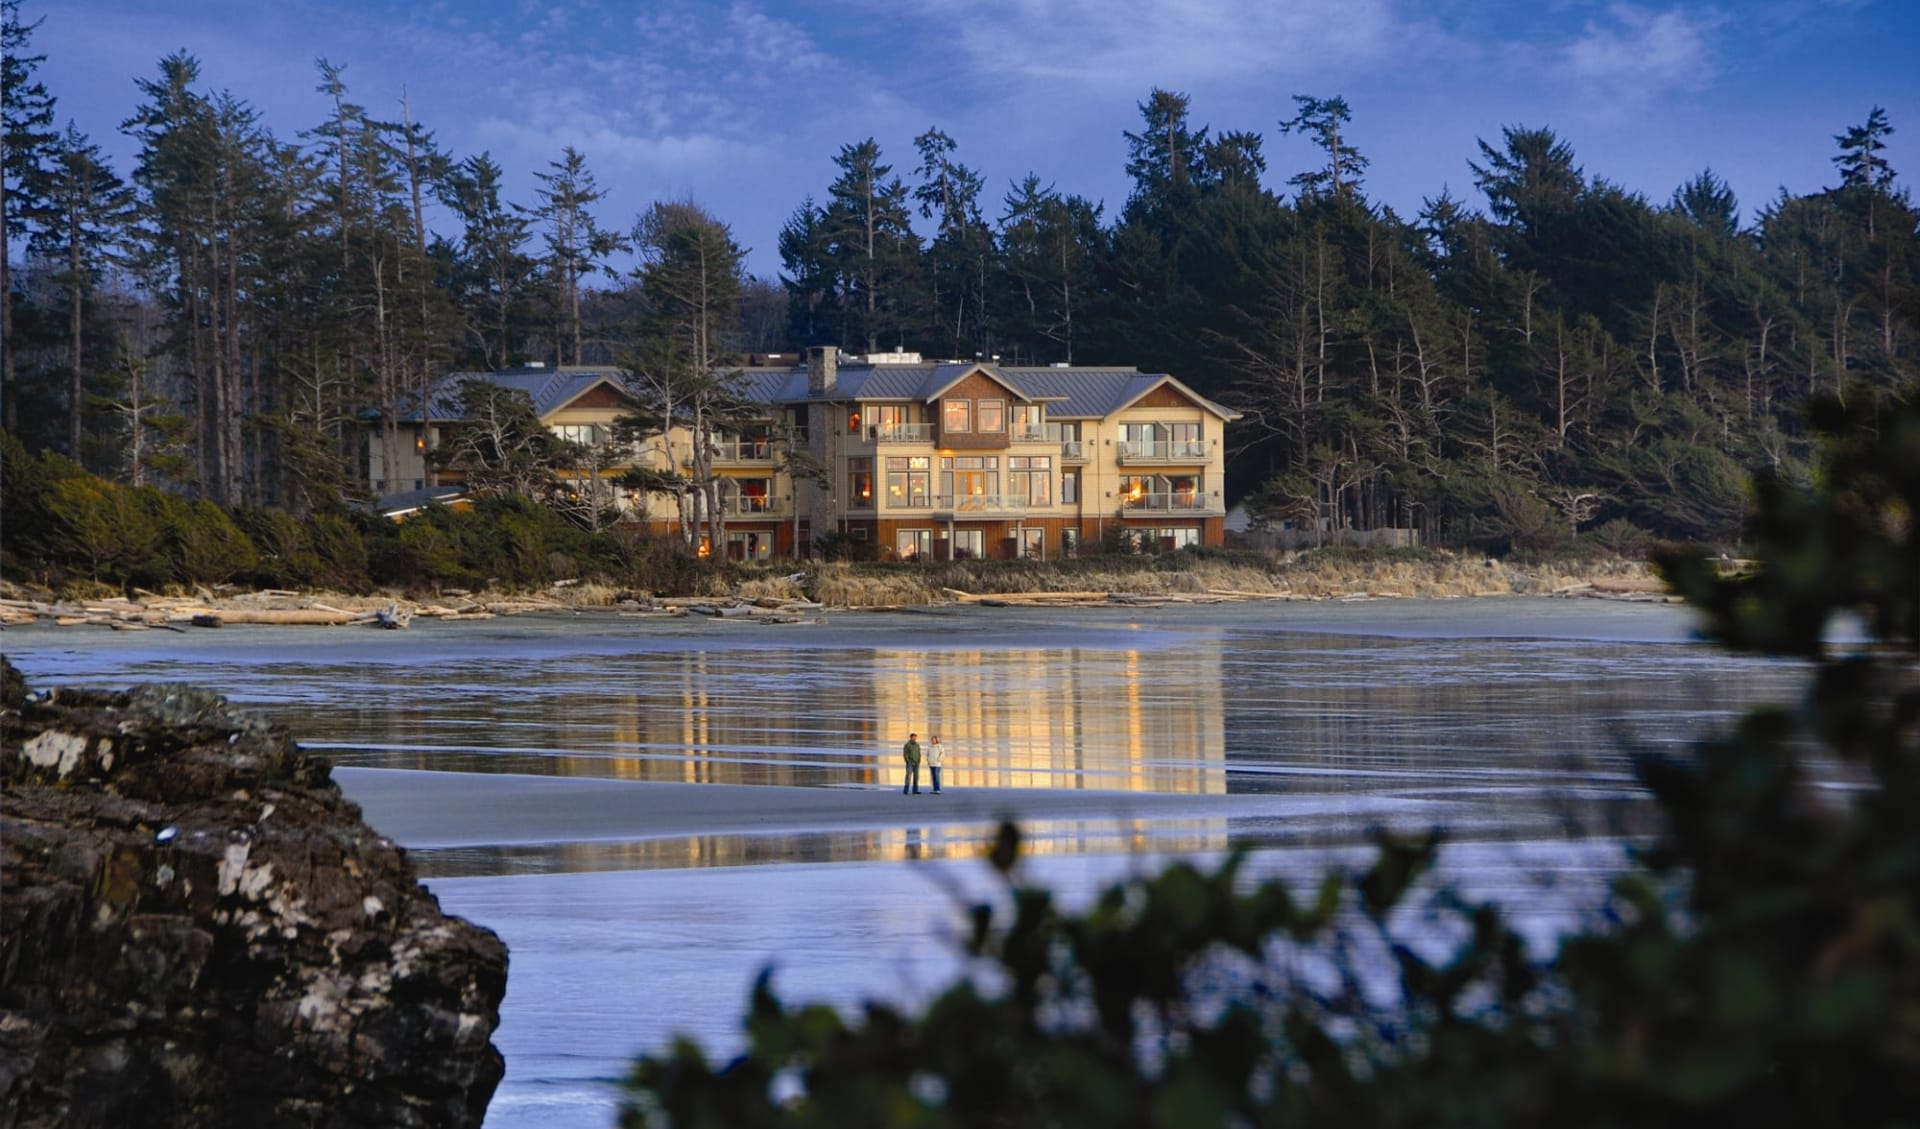 Long Beach Lodge Resort in Tofino:  Long Beach Lodge Resort_FrontView